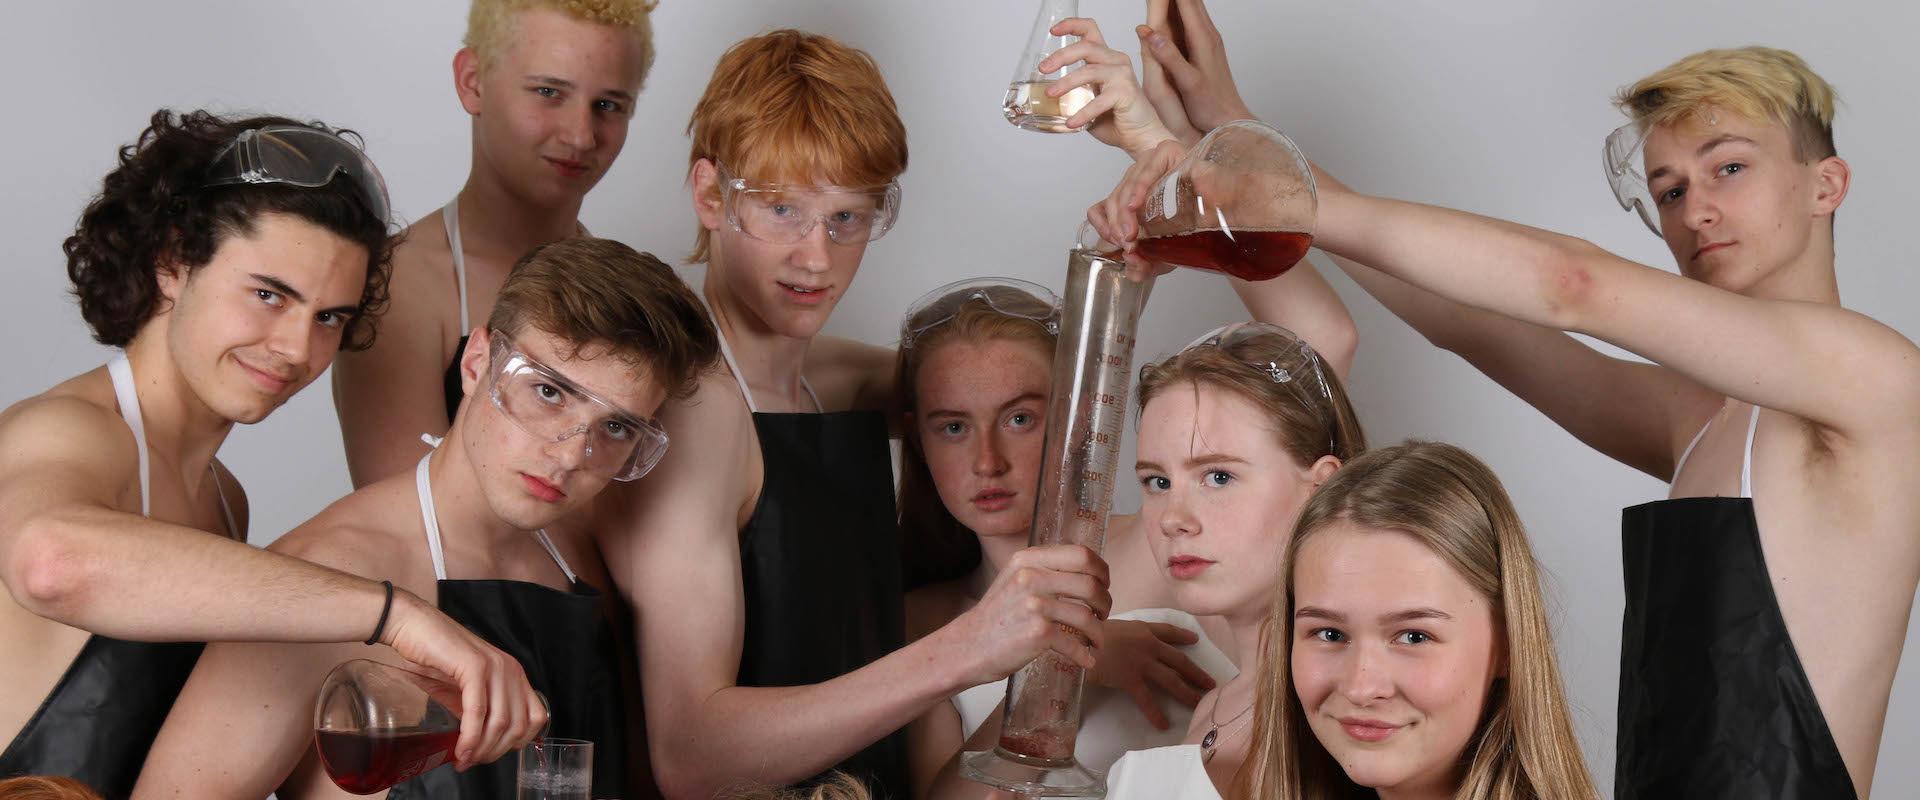 fysik og kemi efterskole